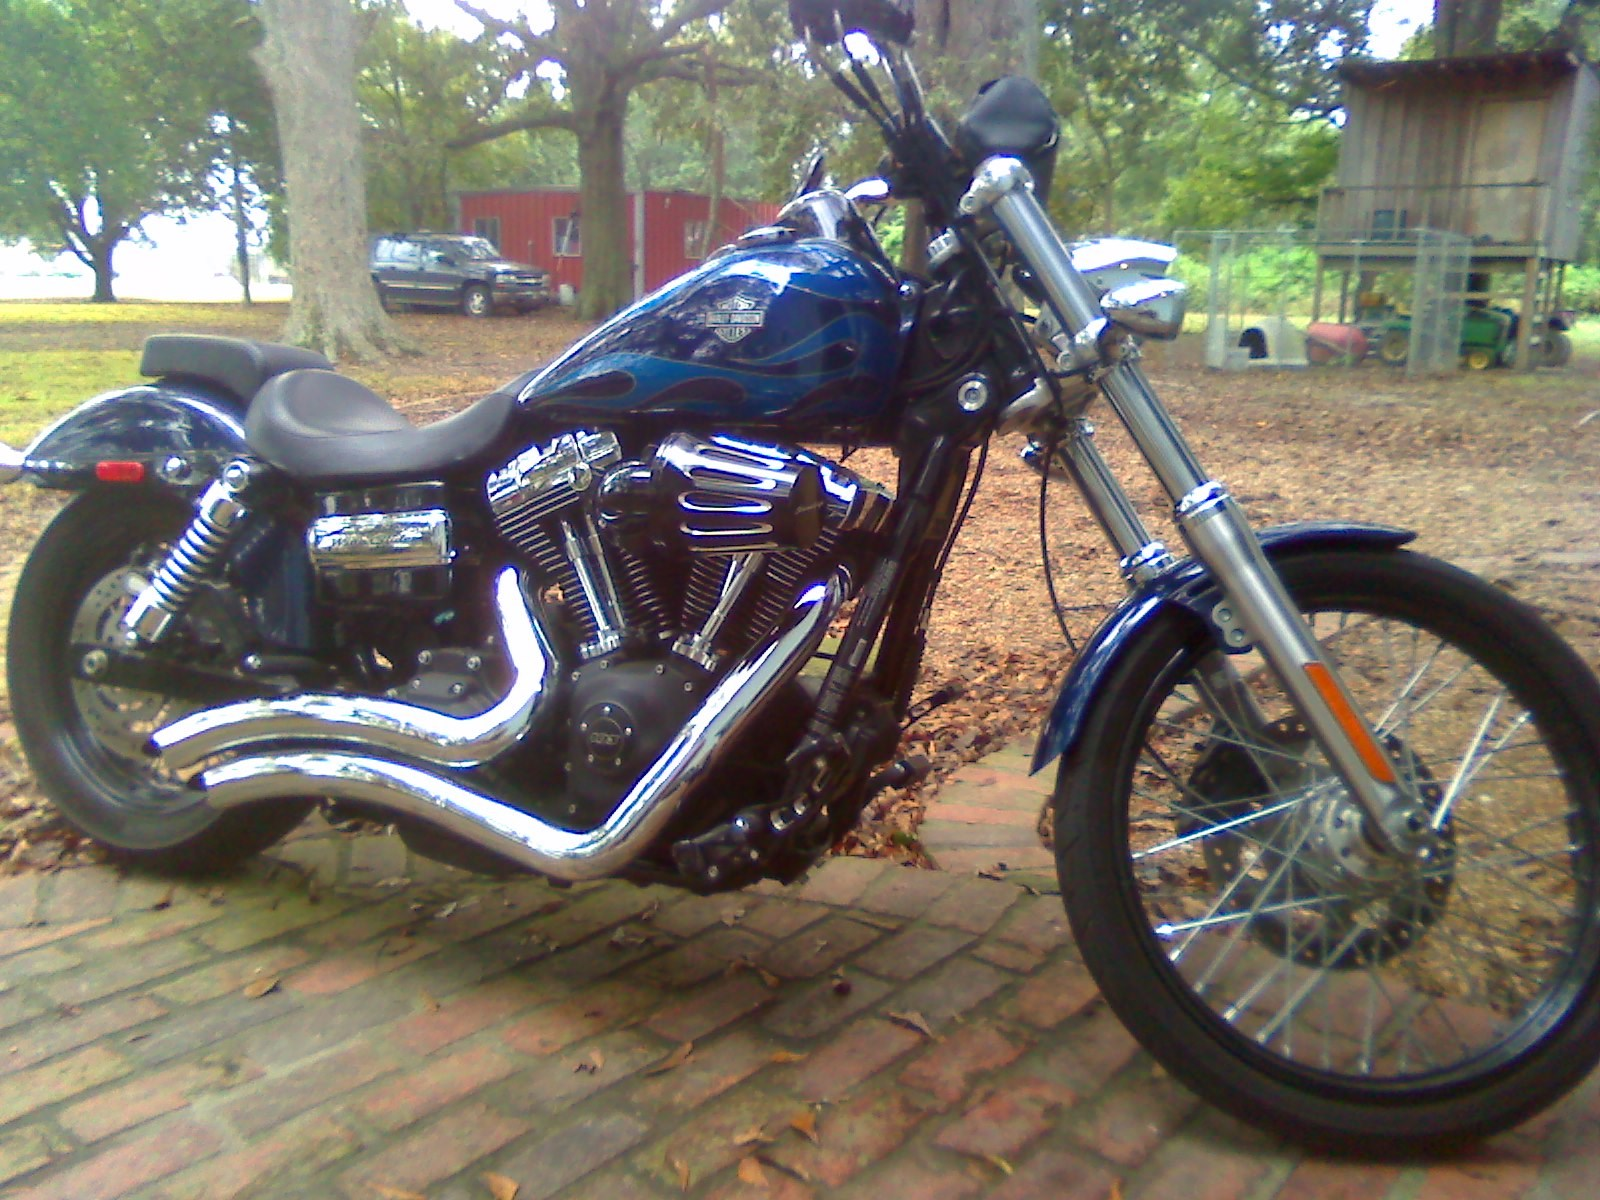 New Harley Davidson Dyna Wide Glide